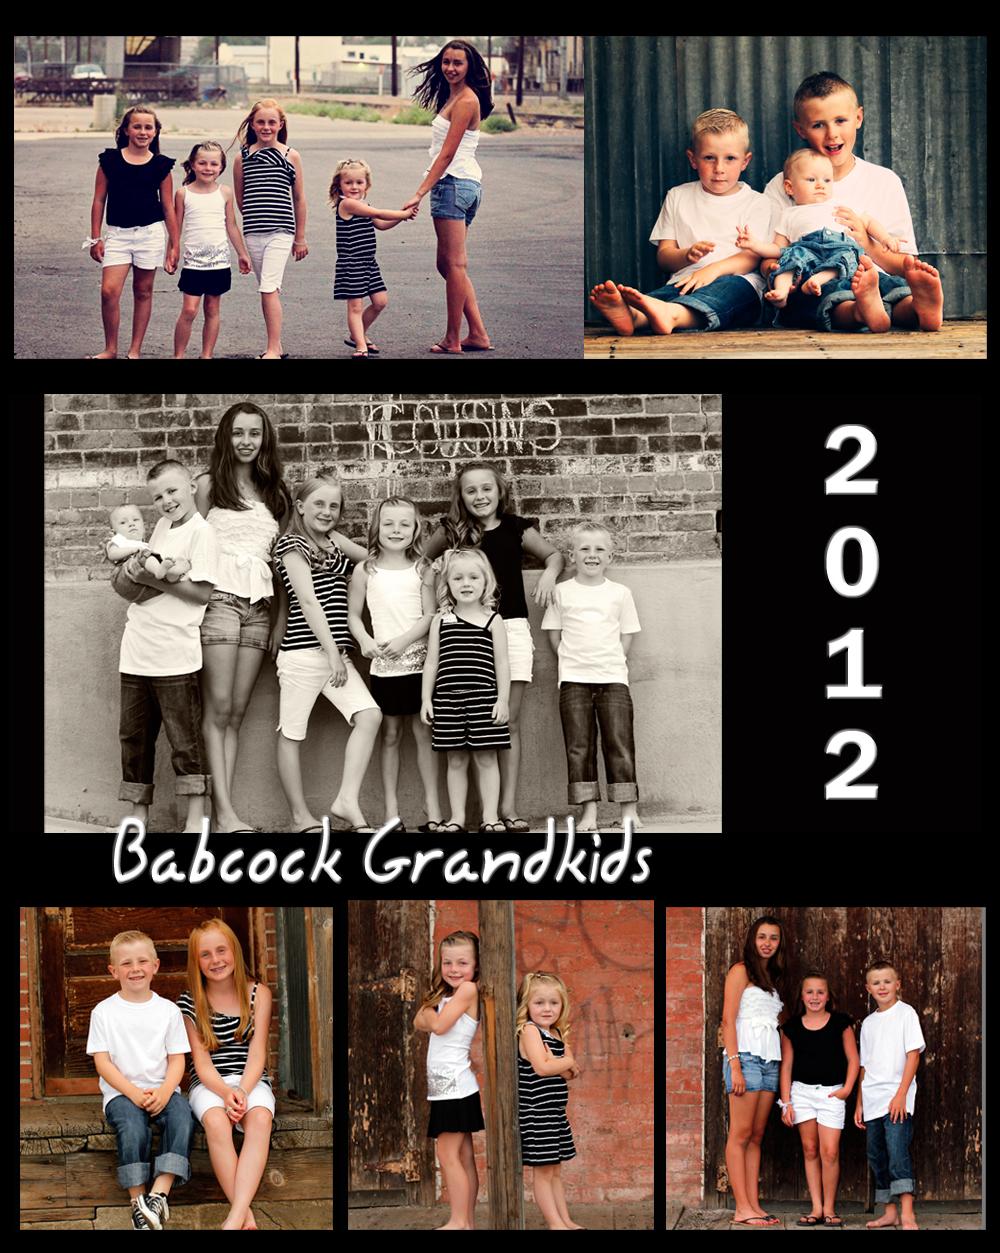 Babcock Grandkids collage